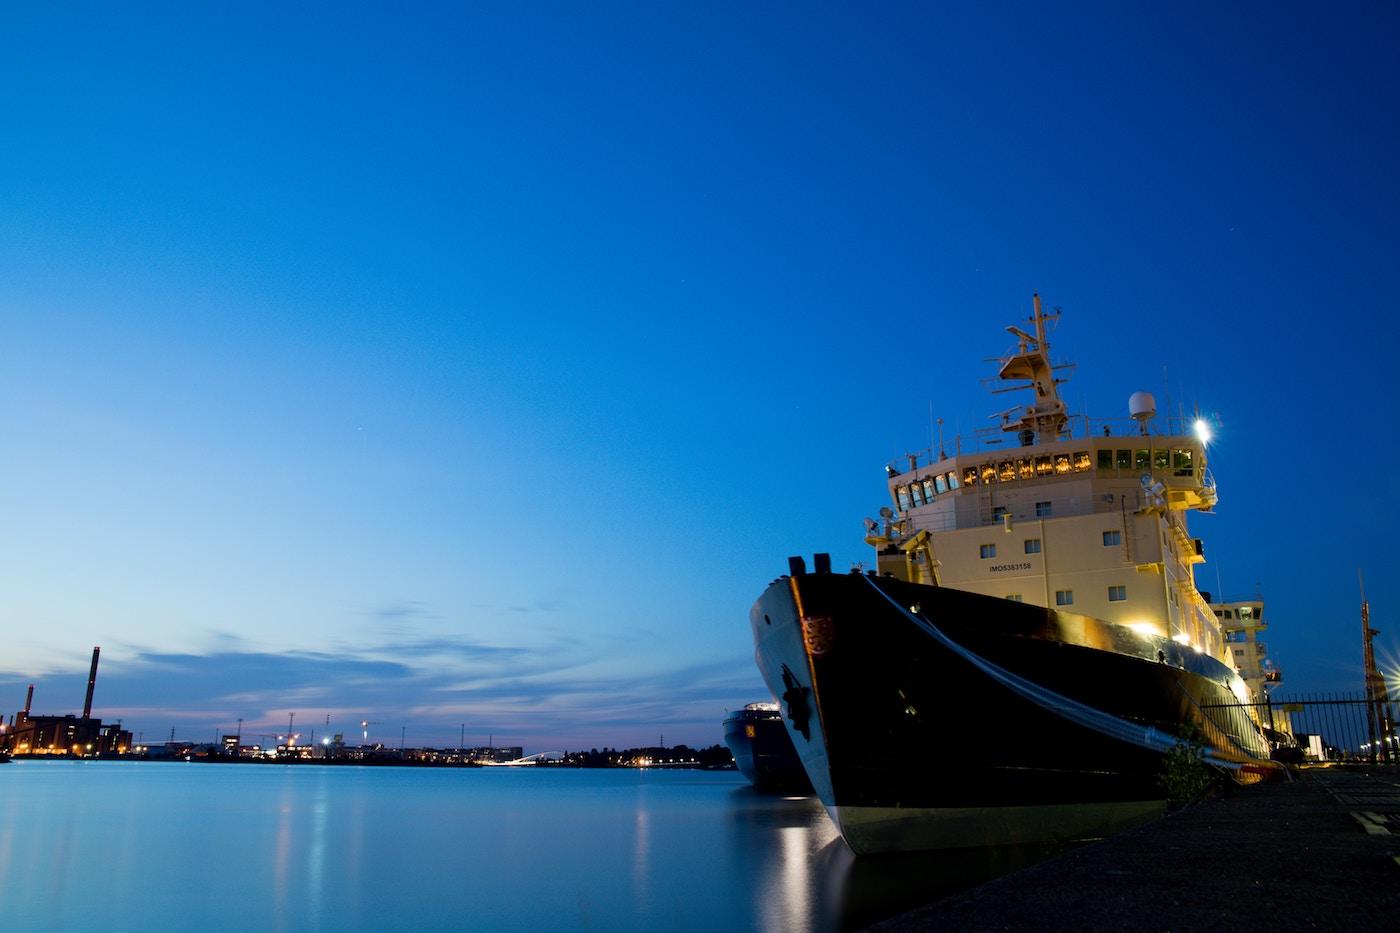 Amerykanci investujuť $30 mln u Mykolaїvśkyj port